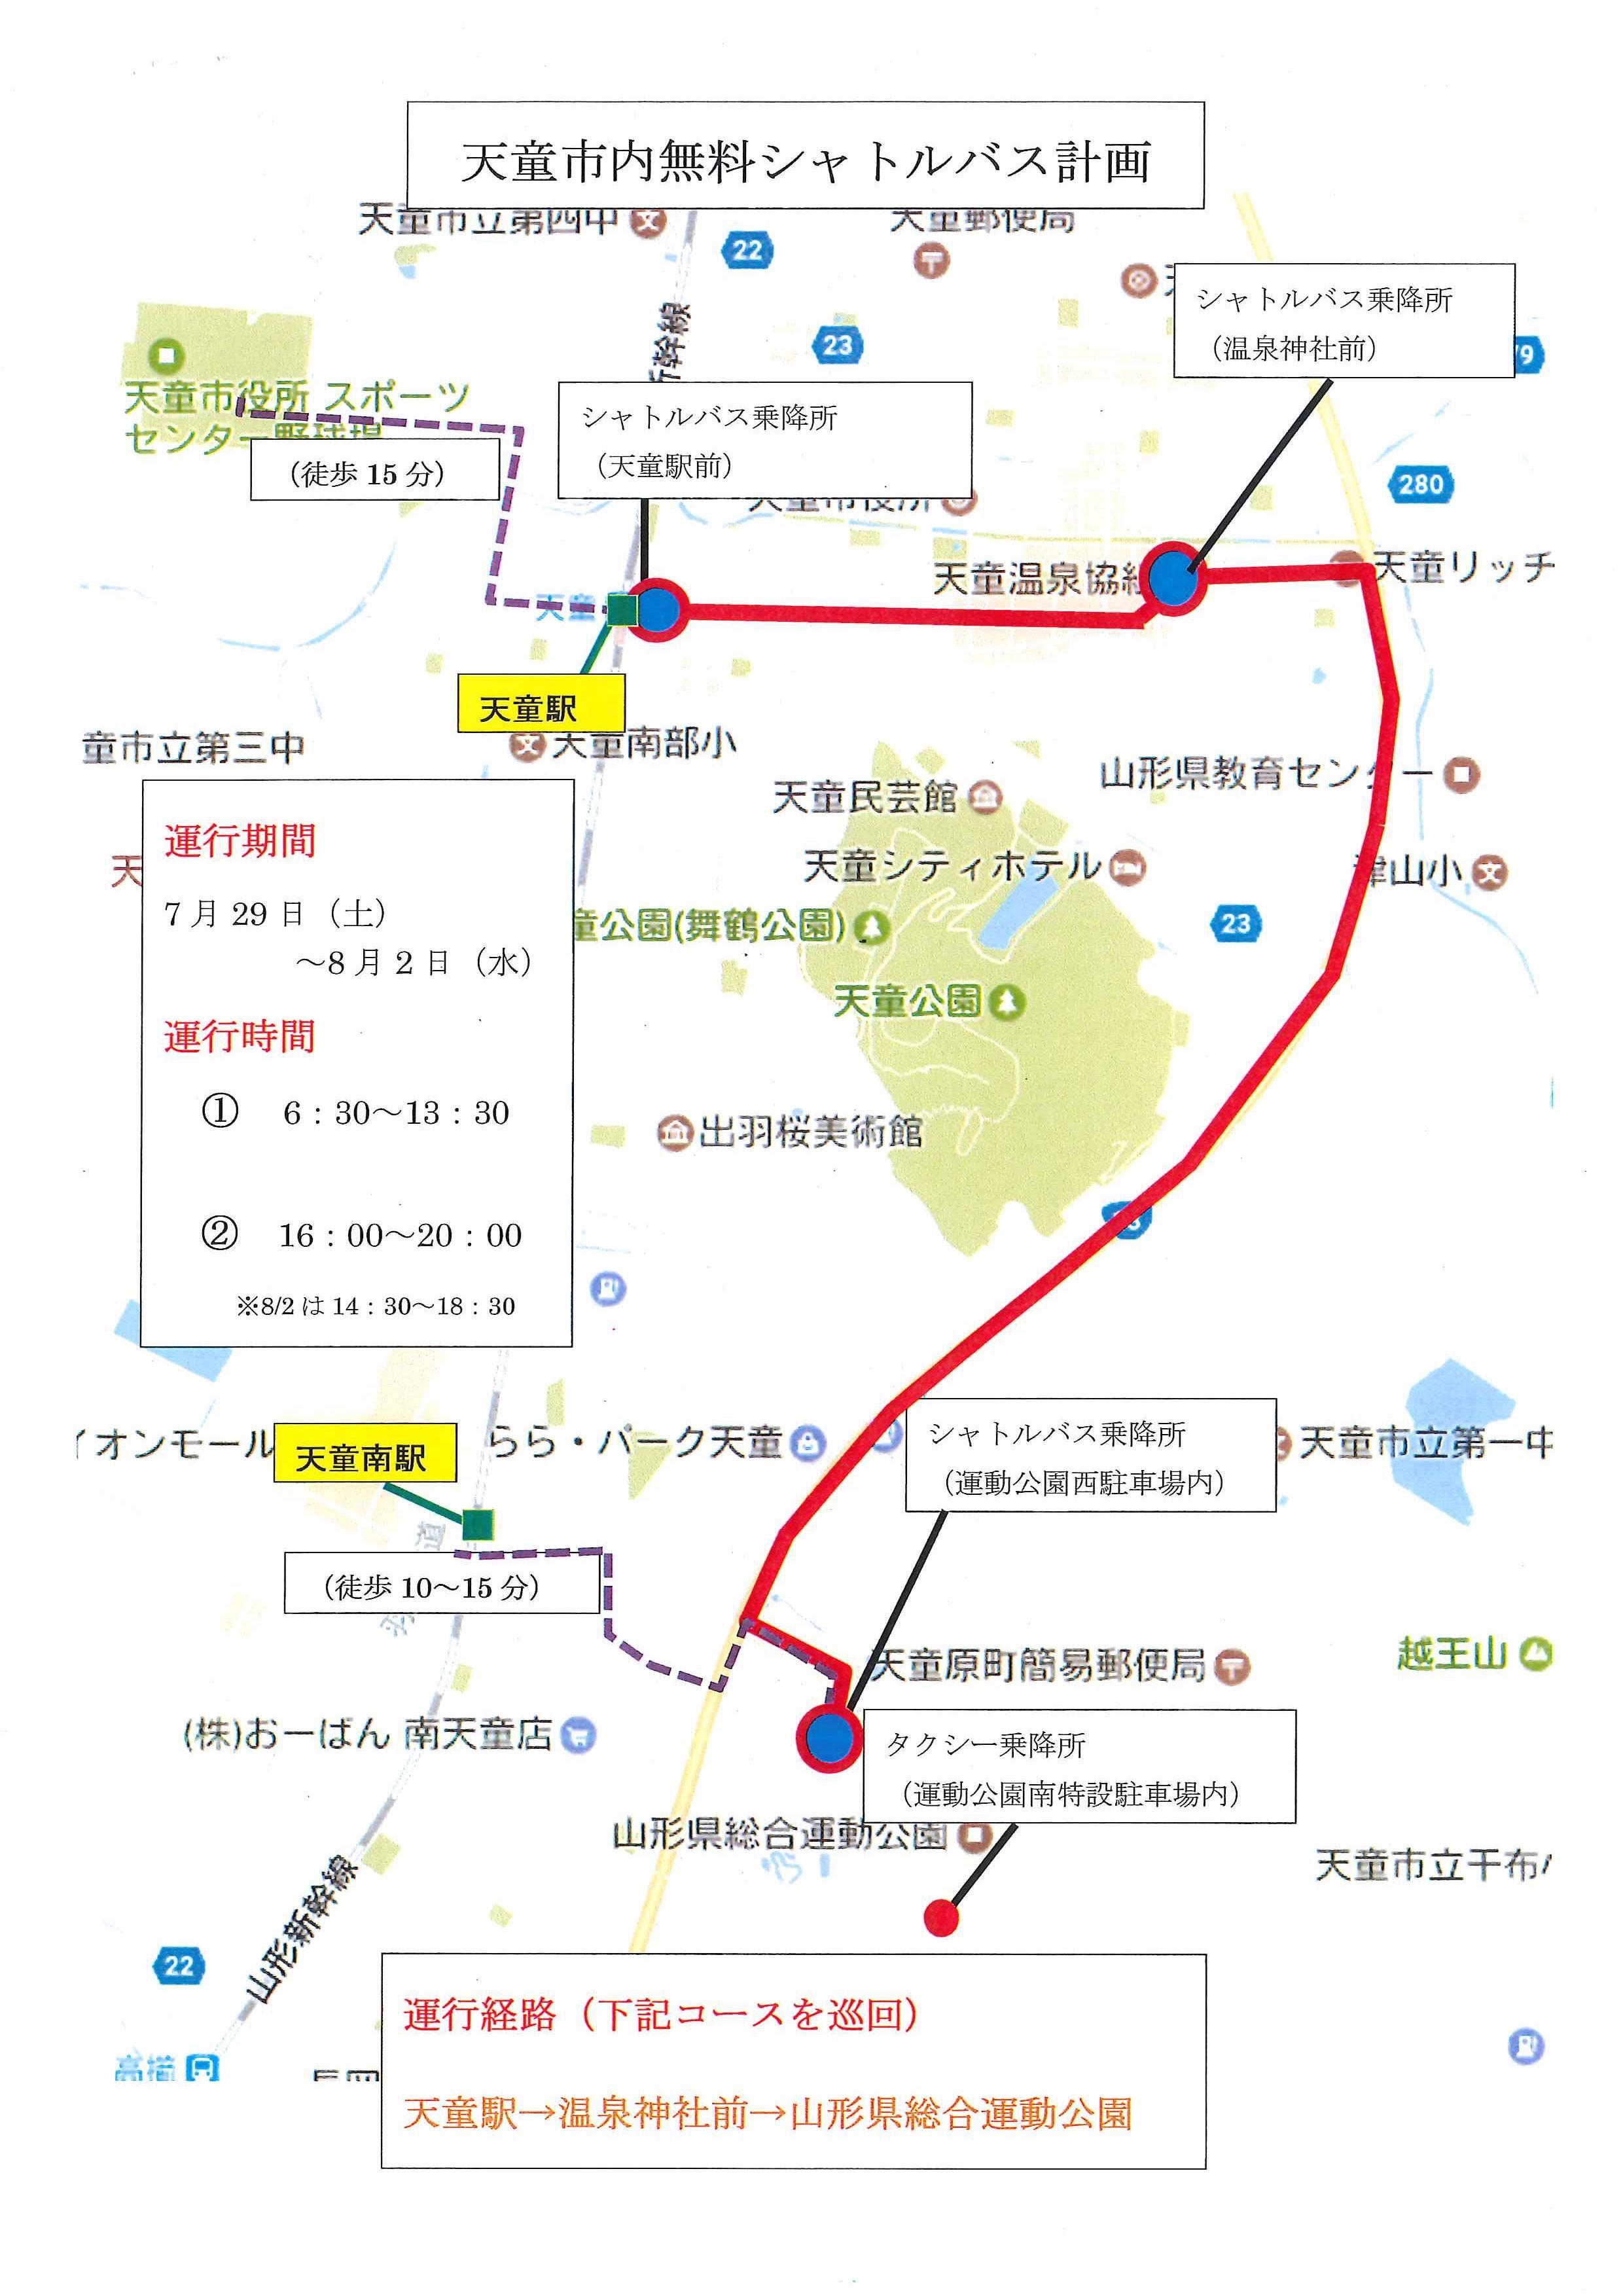 NDスタジアムまで無料シャトルバス決定